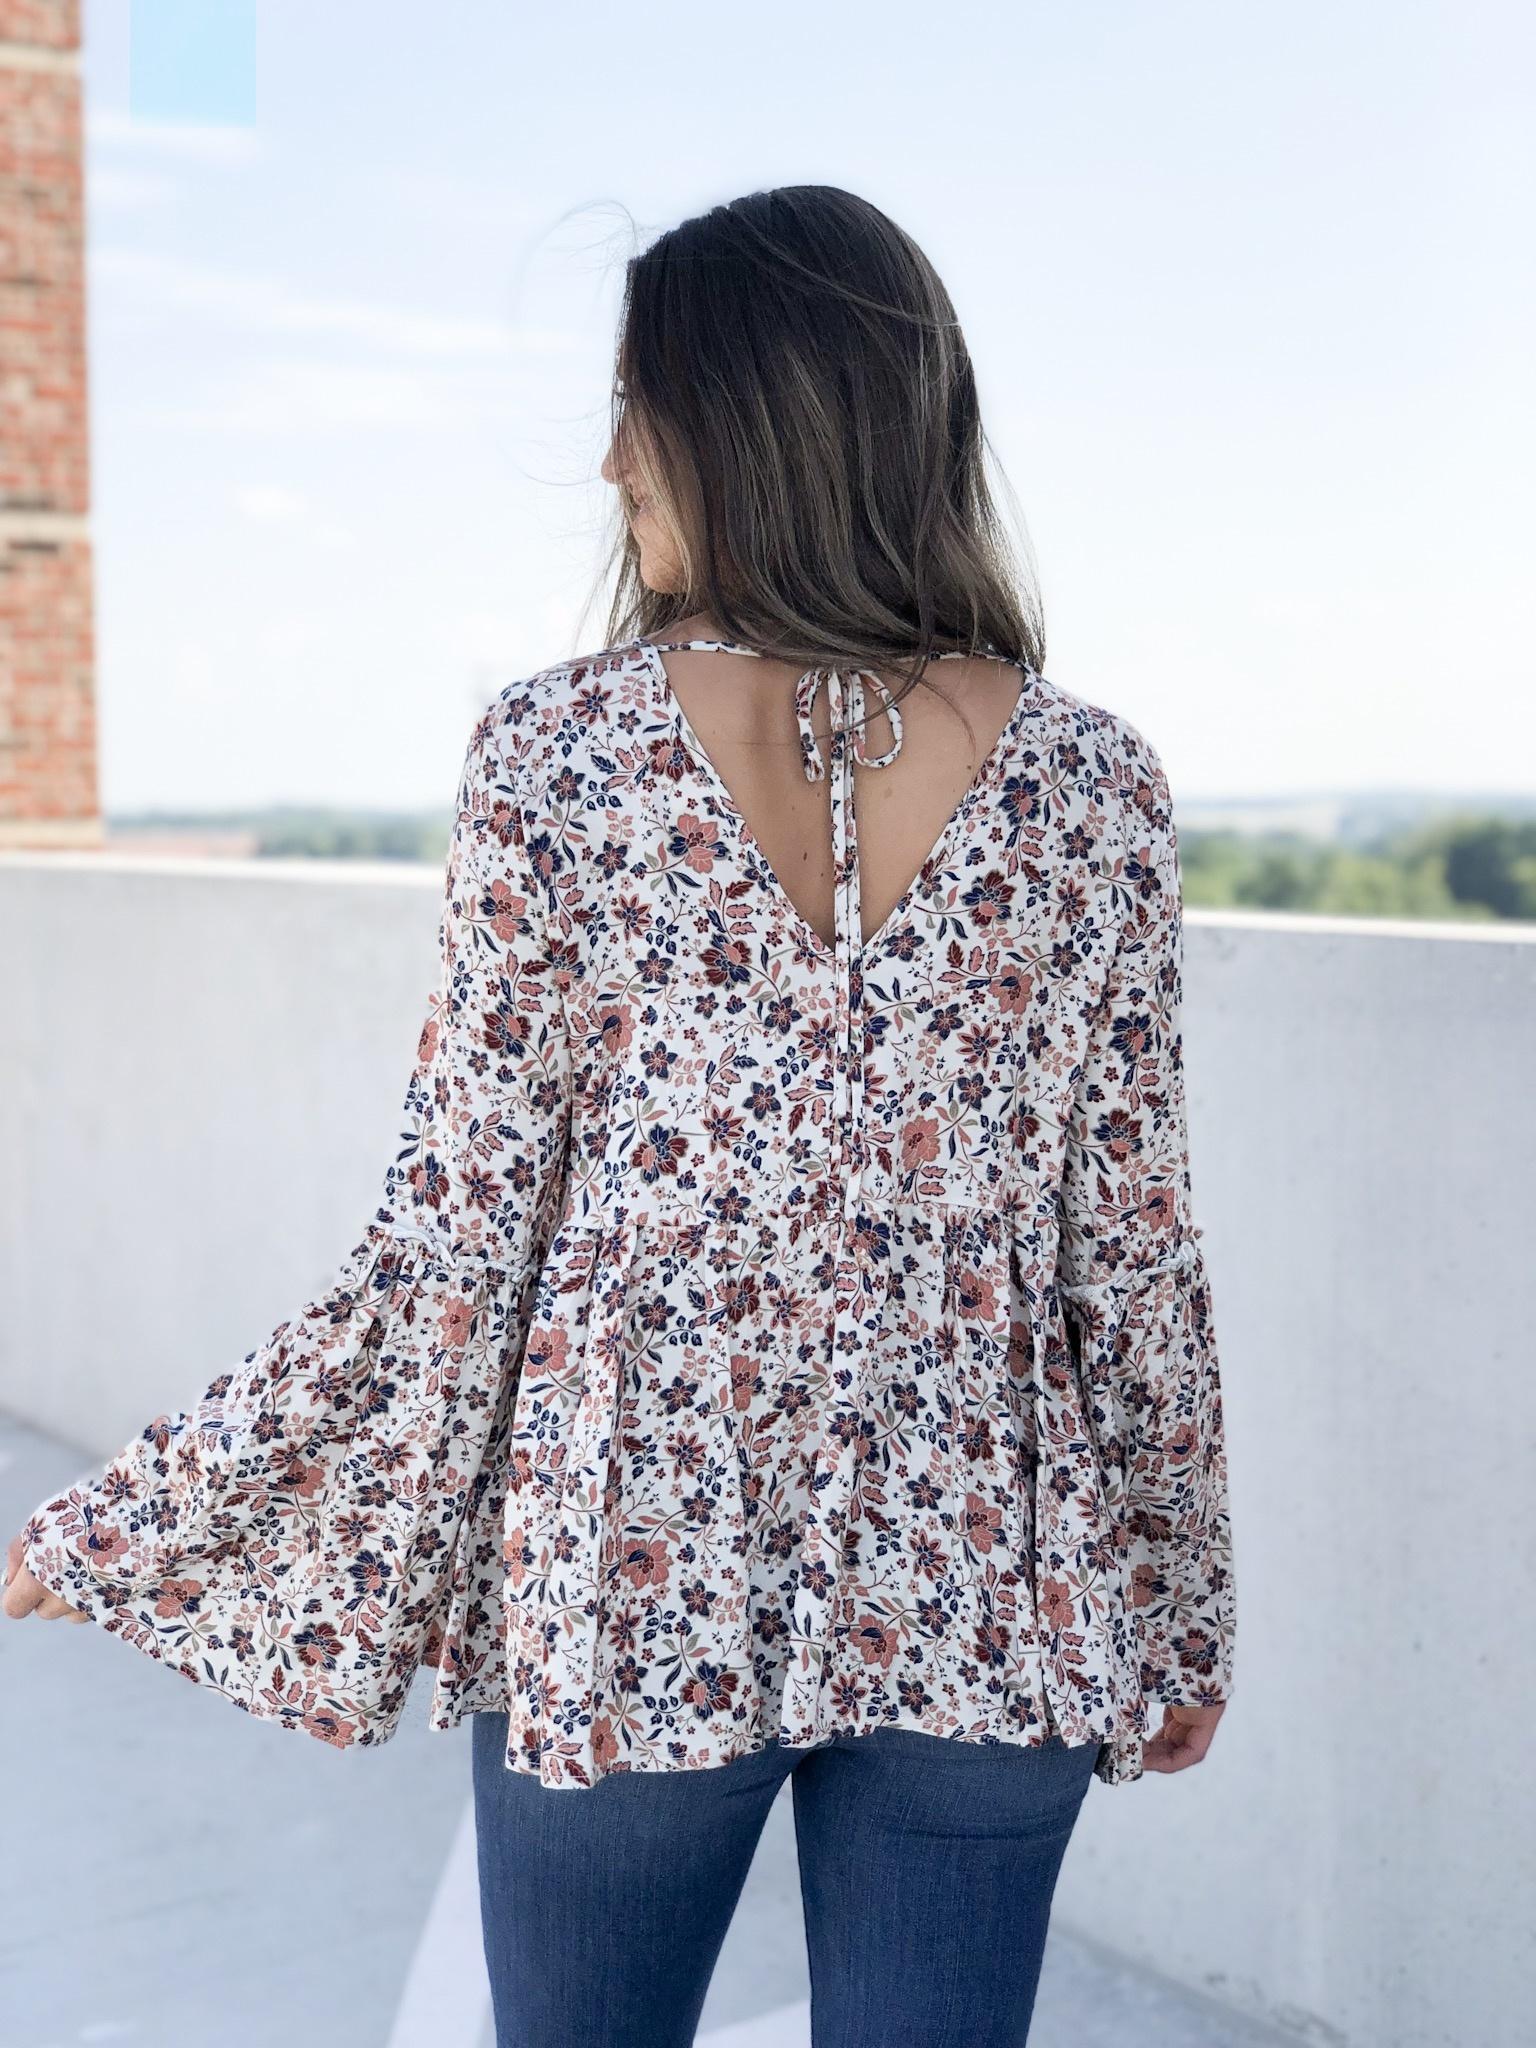 Cream & navy floral print top